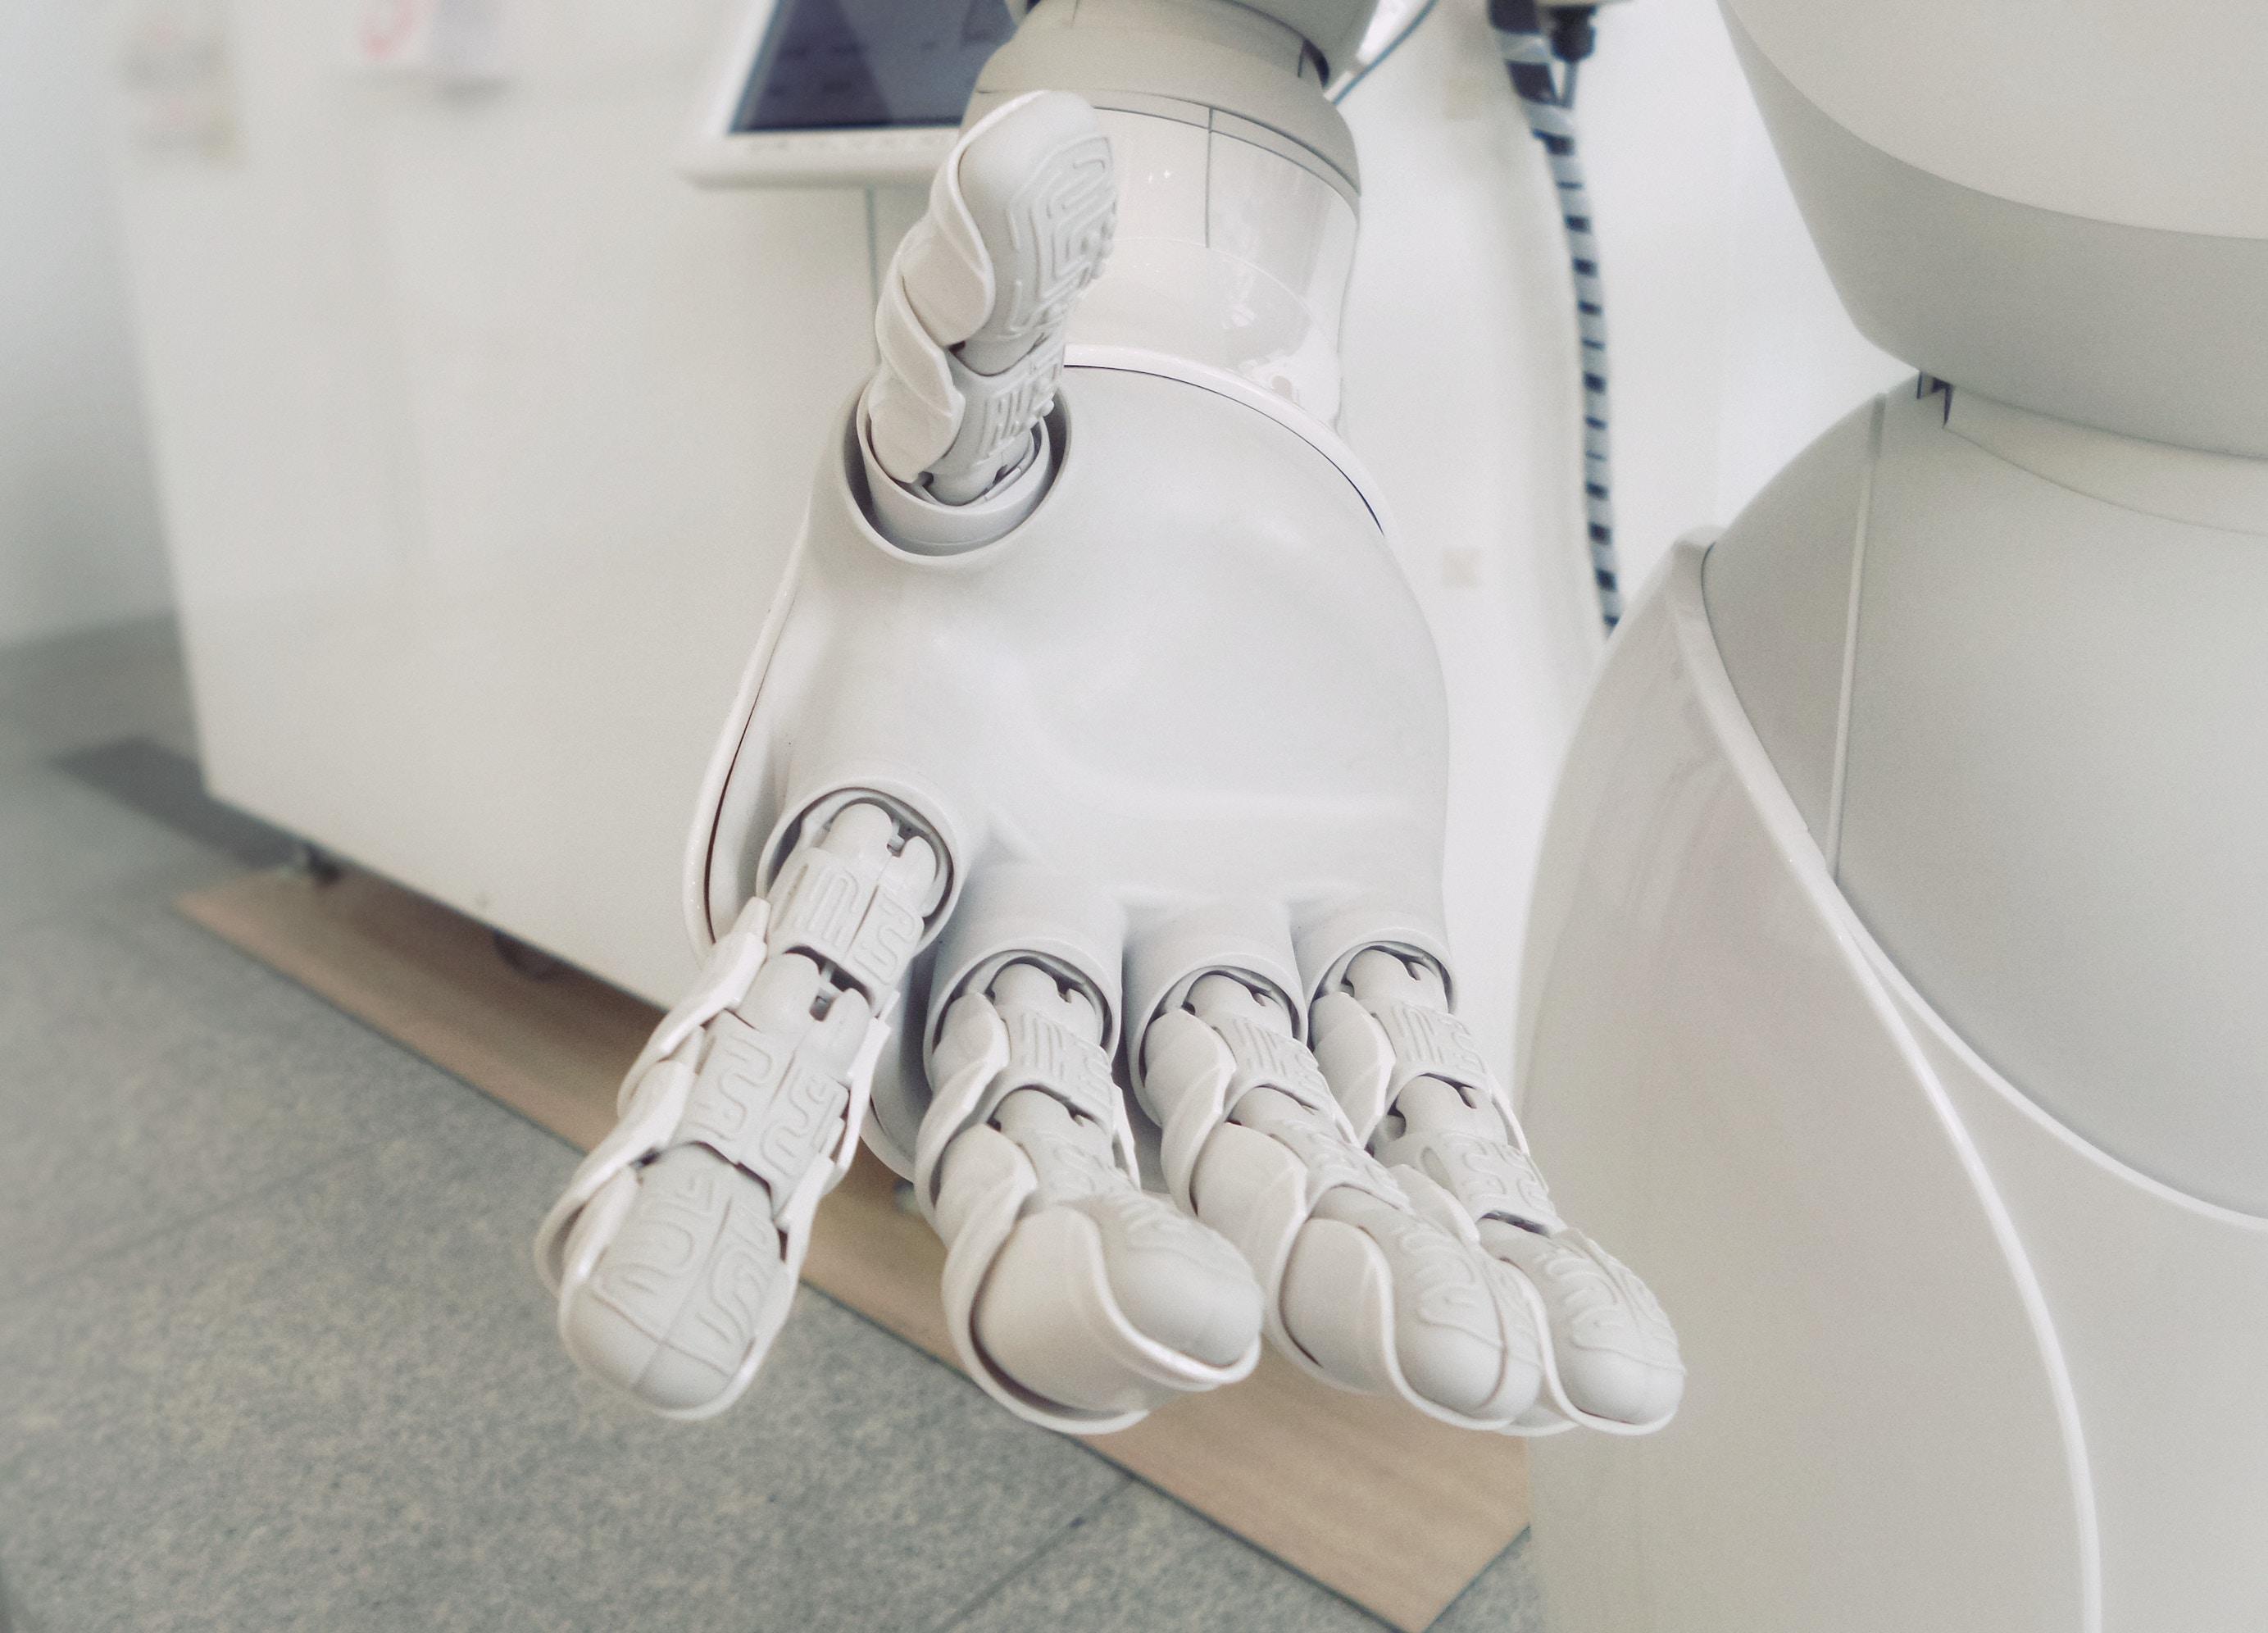 AI technology - robots